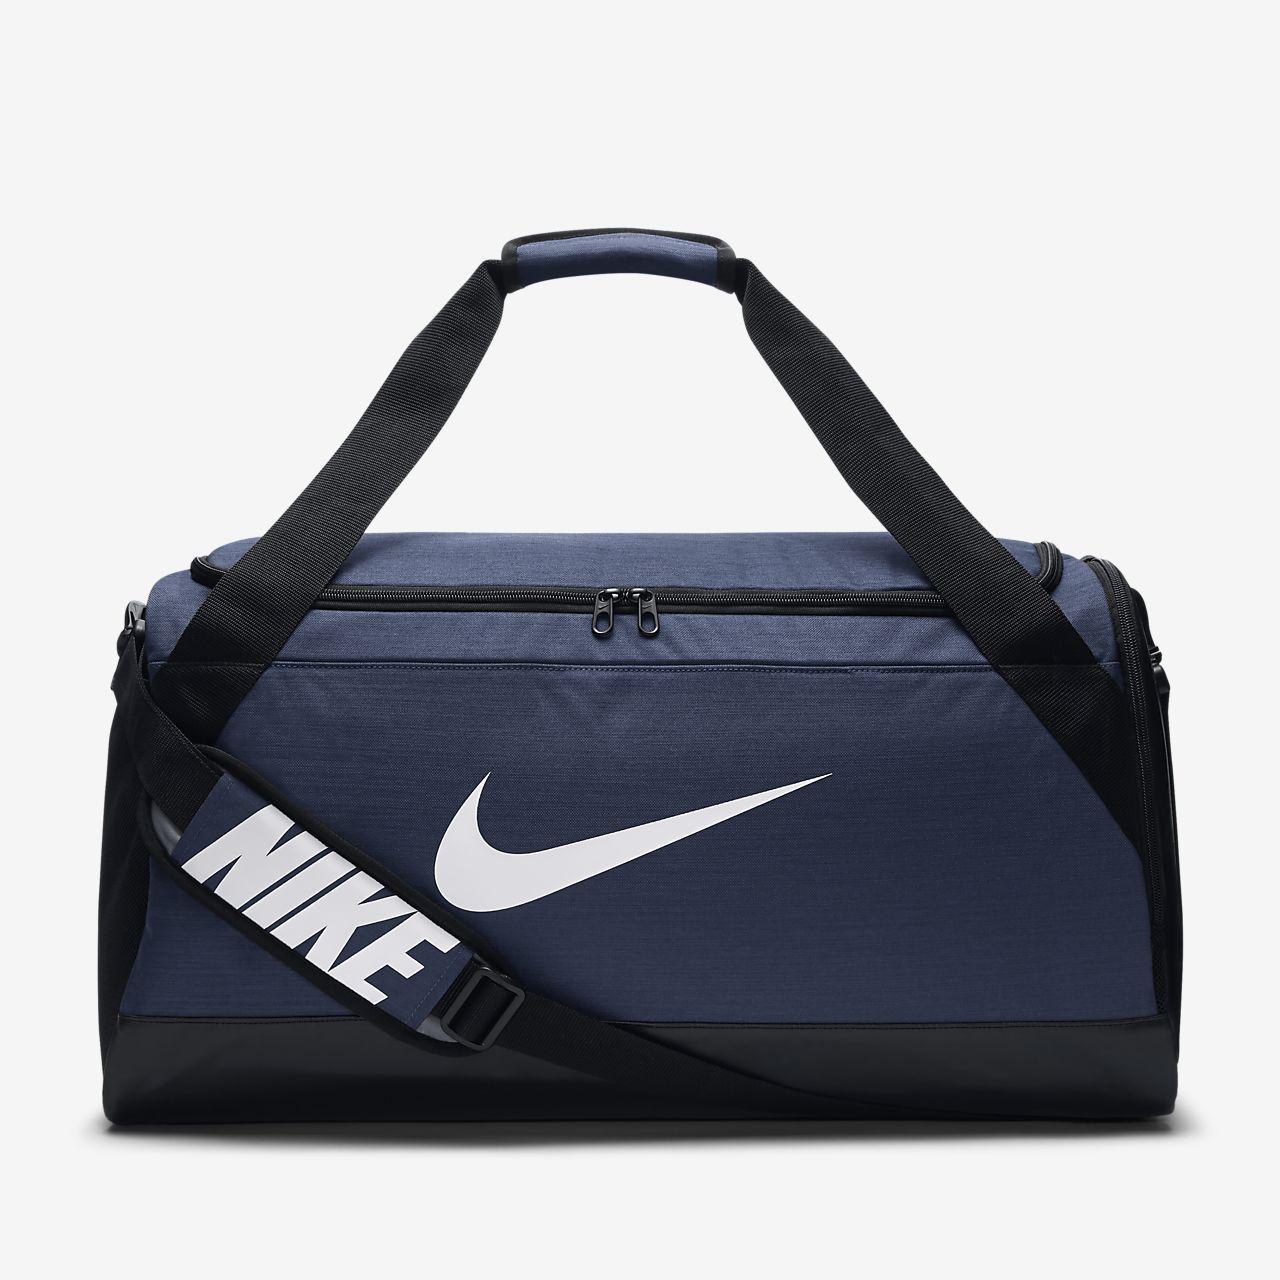 ac57783f10 Sac de sport de training Nike Brasilia (taille moyenne). Nike.com FR